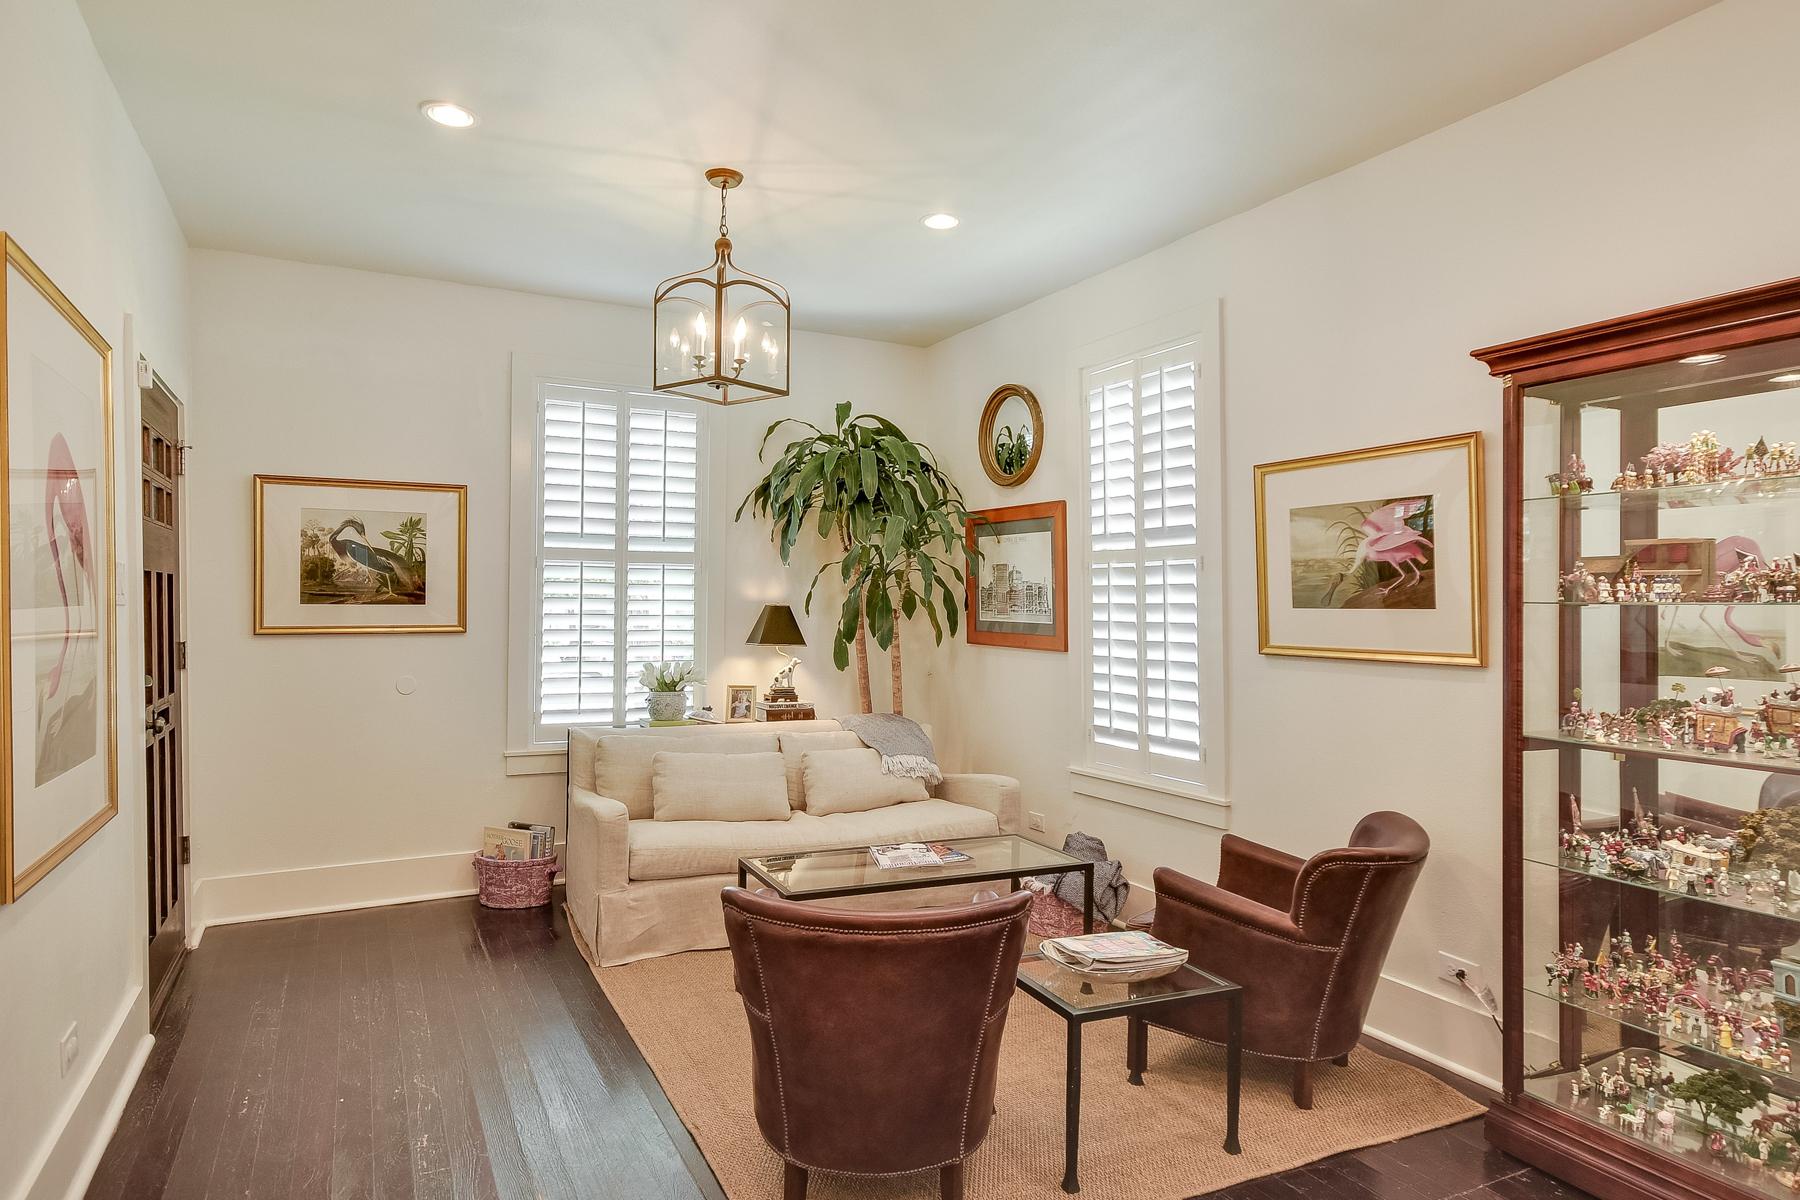 Additional photo for property listing at Adorable Bungalow in Mahncke Park 423 Queen Anne Ct San Antonio, Texas 78209 Estados Unidos